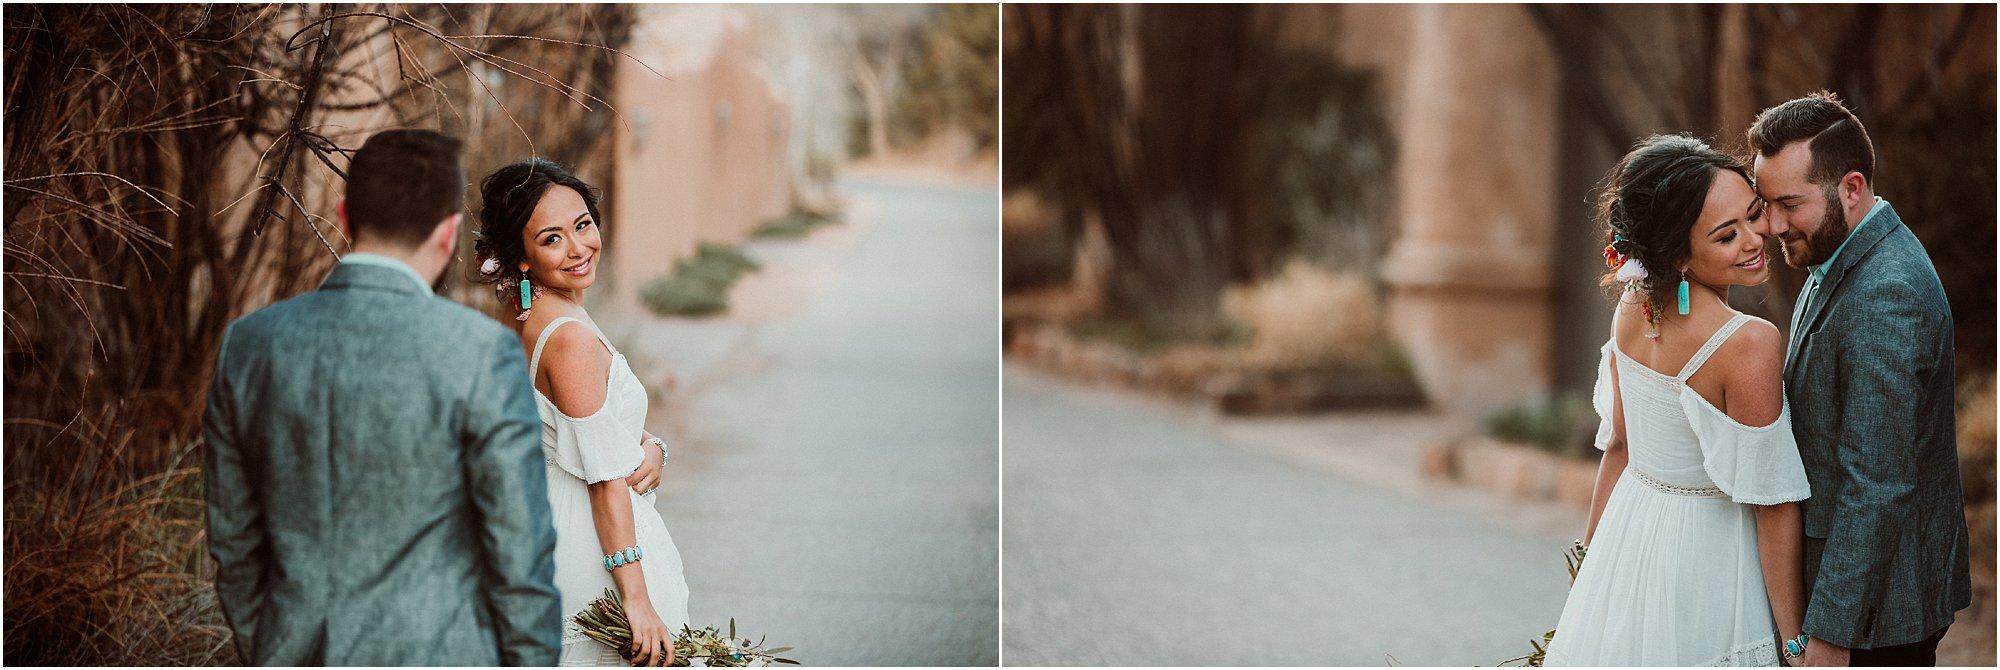 Blue Rose Photography030